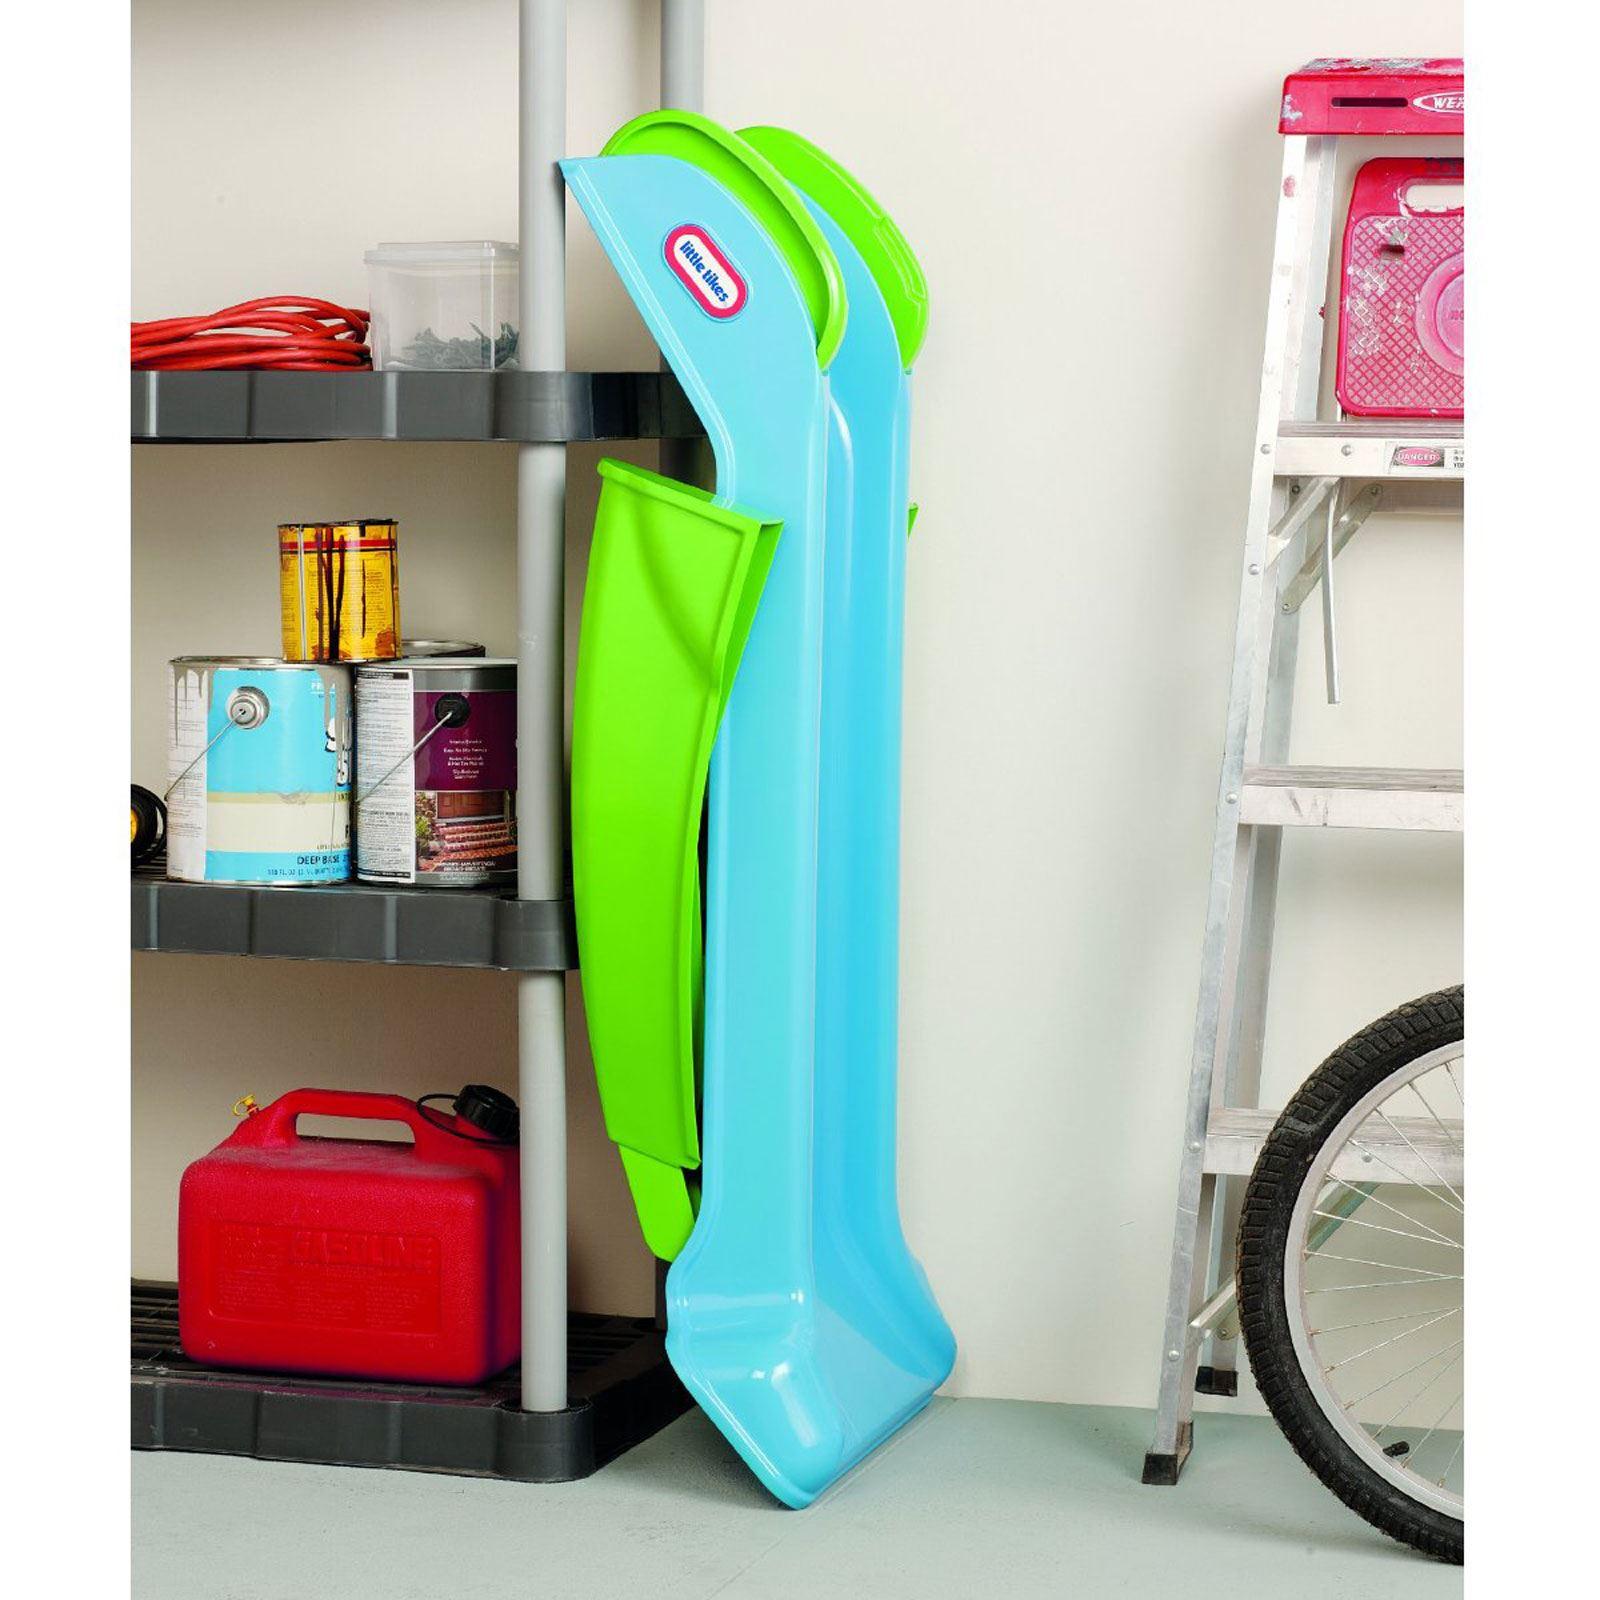 little tikes mein erstes rutsche blau gr n kinder. Black Bedroom Furniture Sets. Home Design Ideas